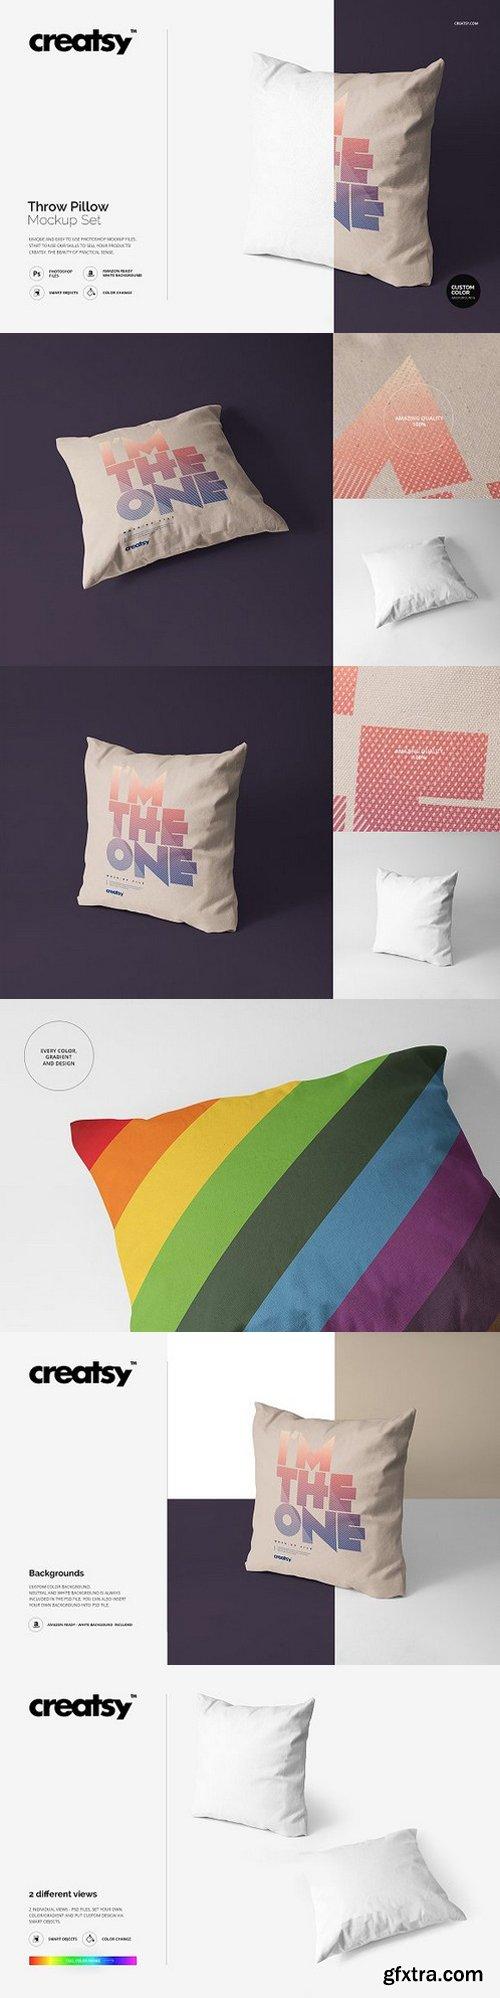 CM - Throw Pillow Mockup Set 1158464